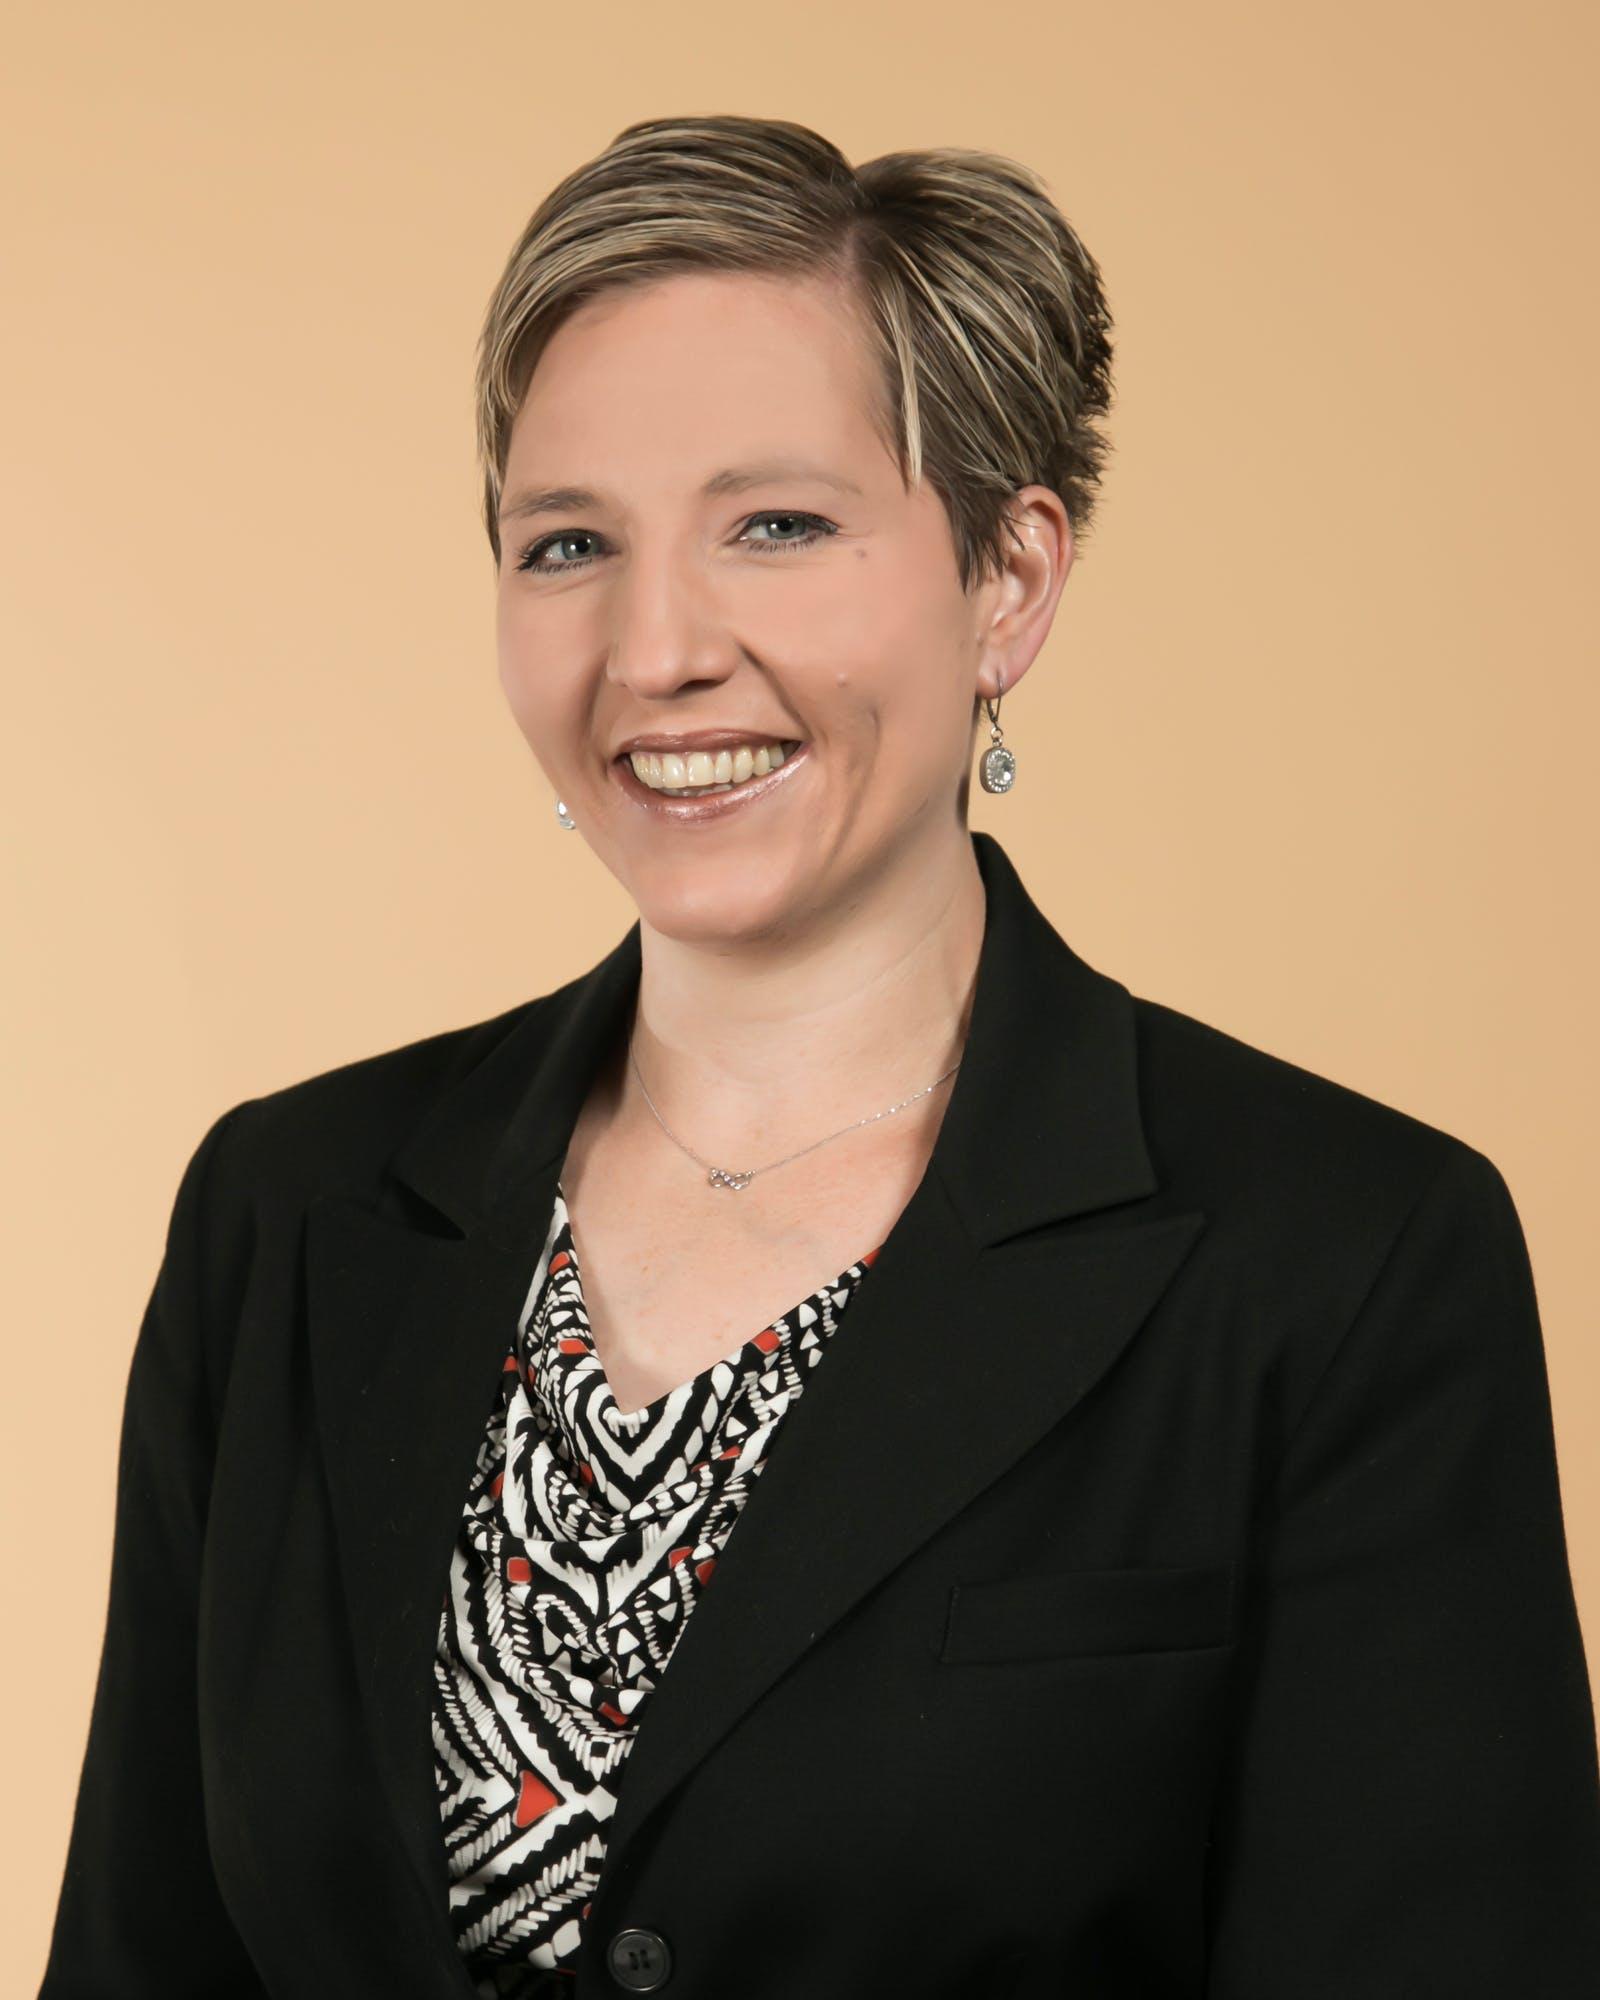 The coronavirus pandemic spurred Kirsten Eickenberg's decision to divorce.